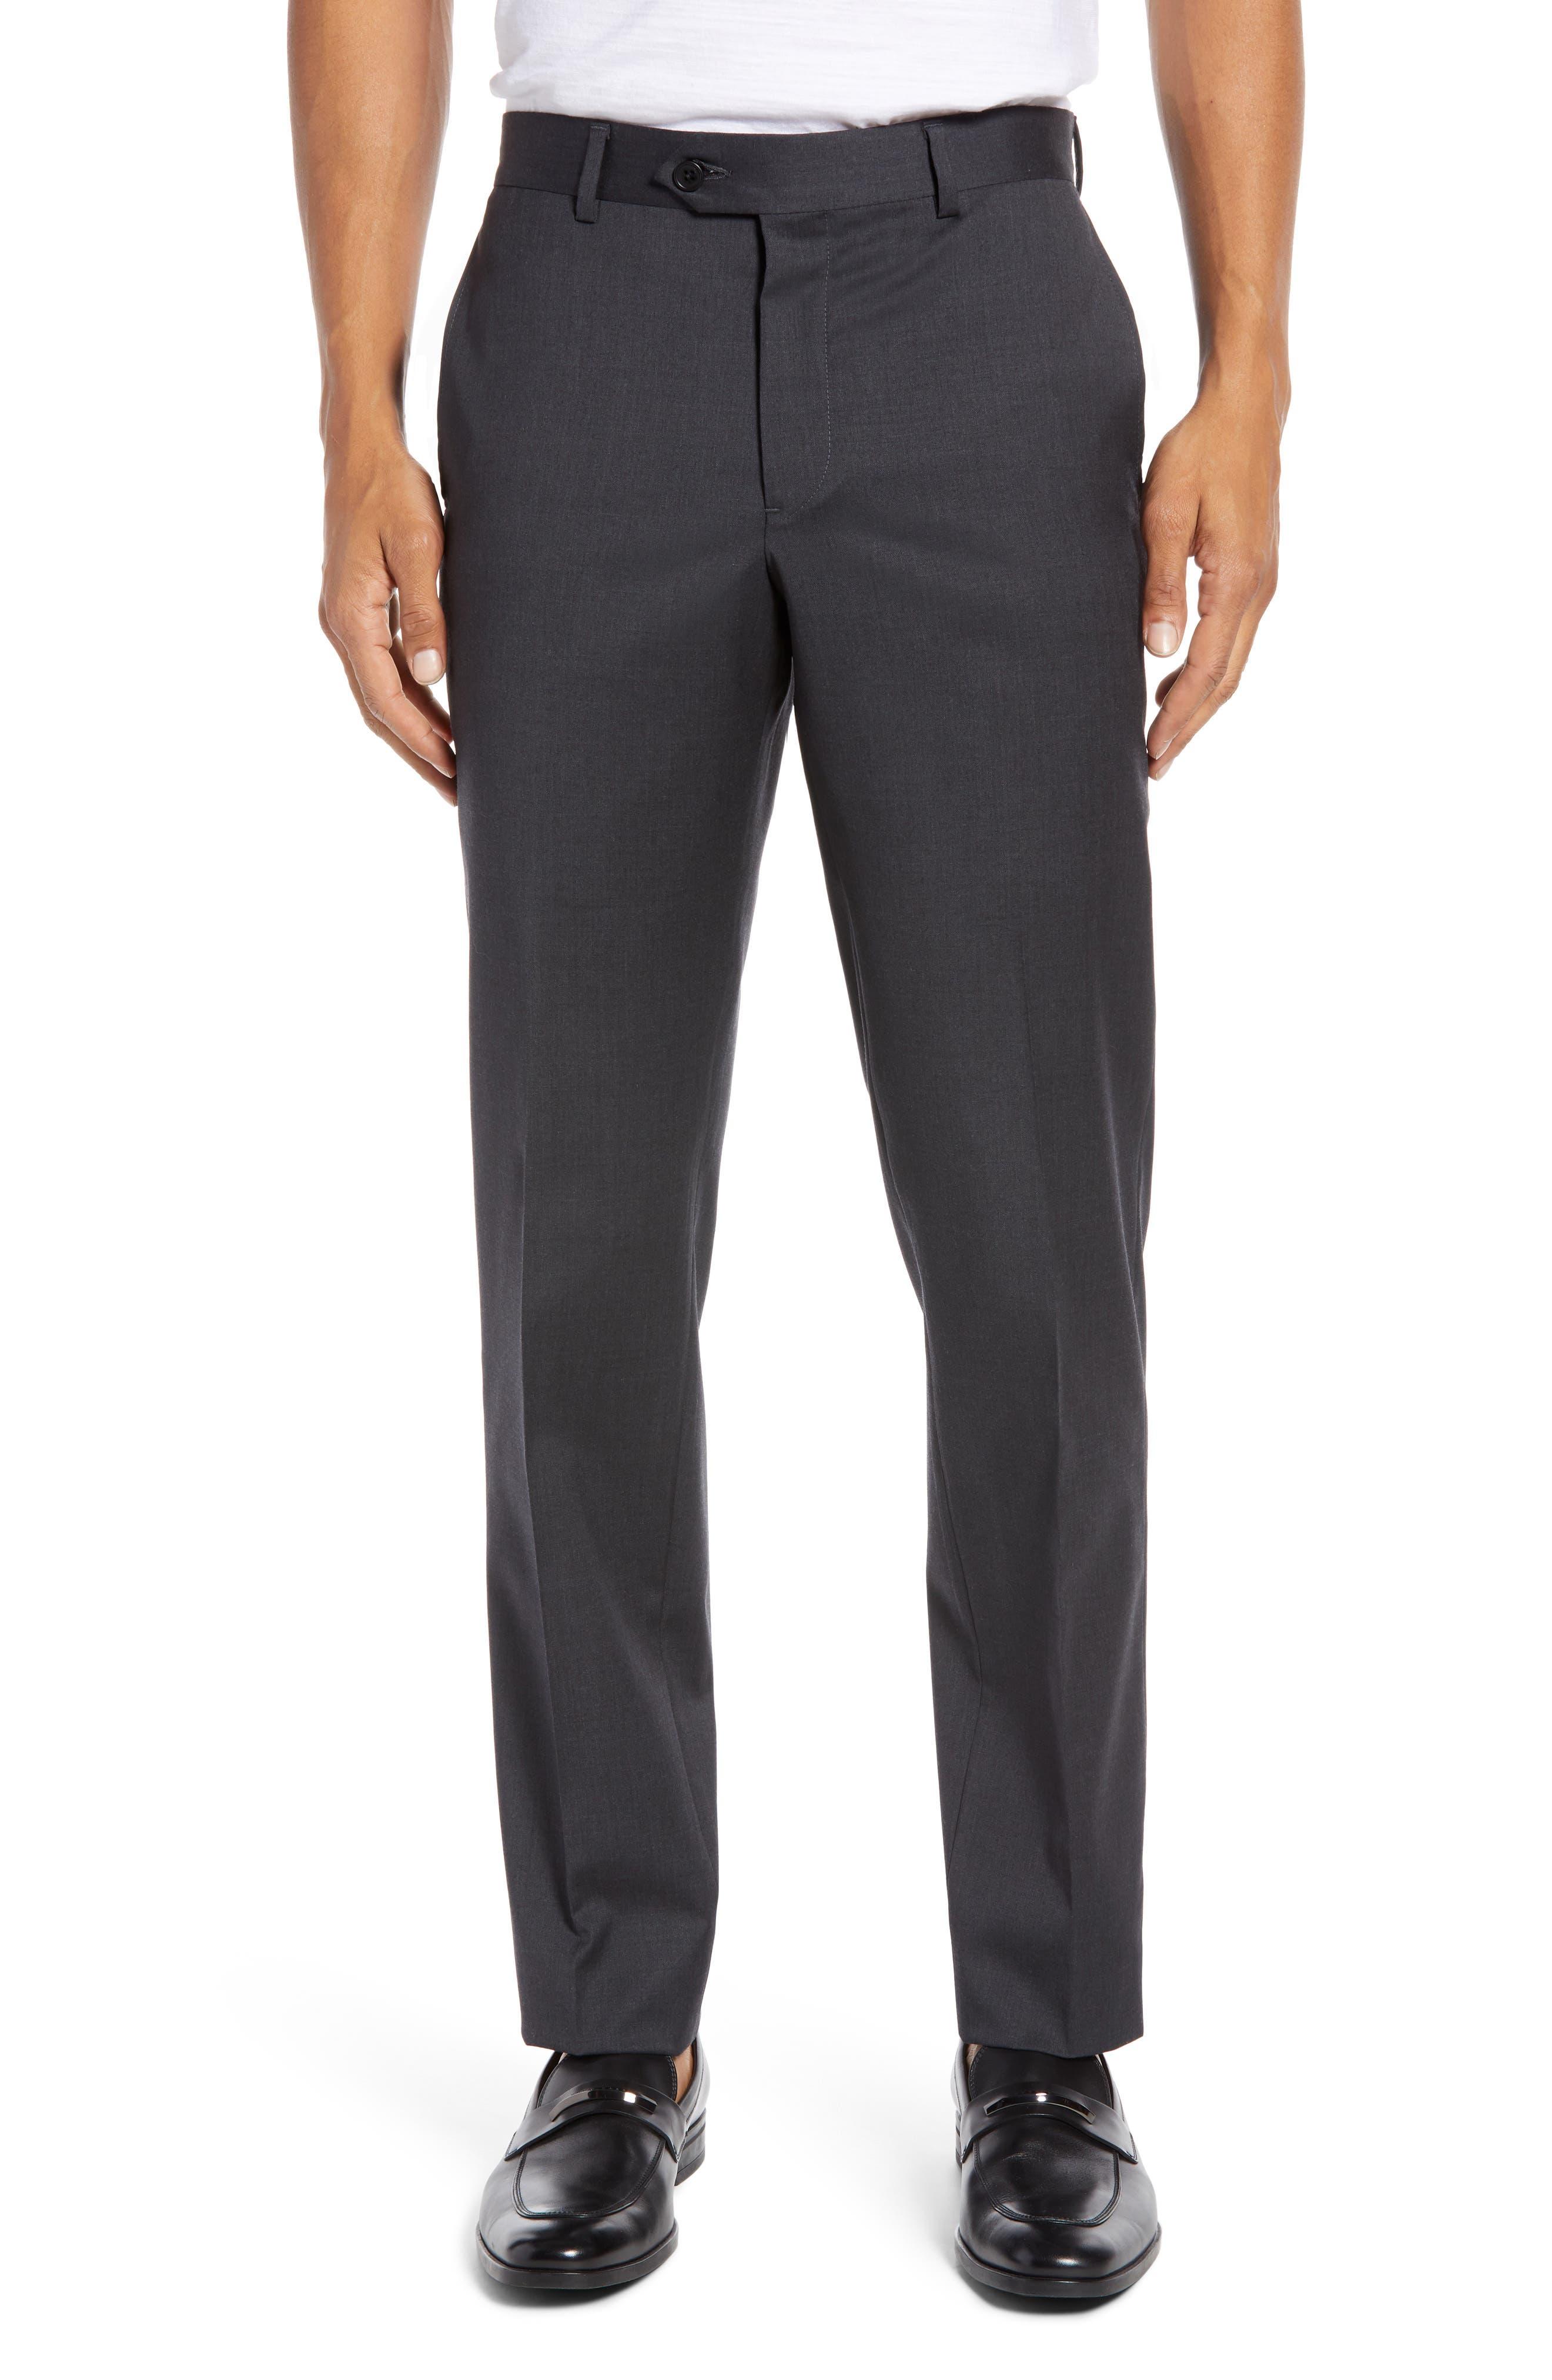 NORDSTROM MEN'S SHOP Trim Fit Stretch Wool Trousers, Main, color, CHARCOAL